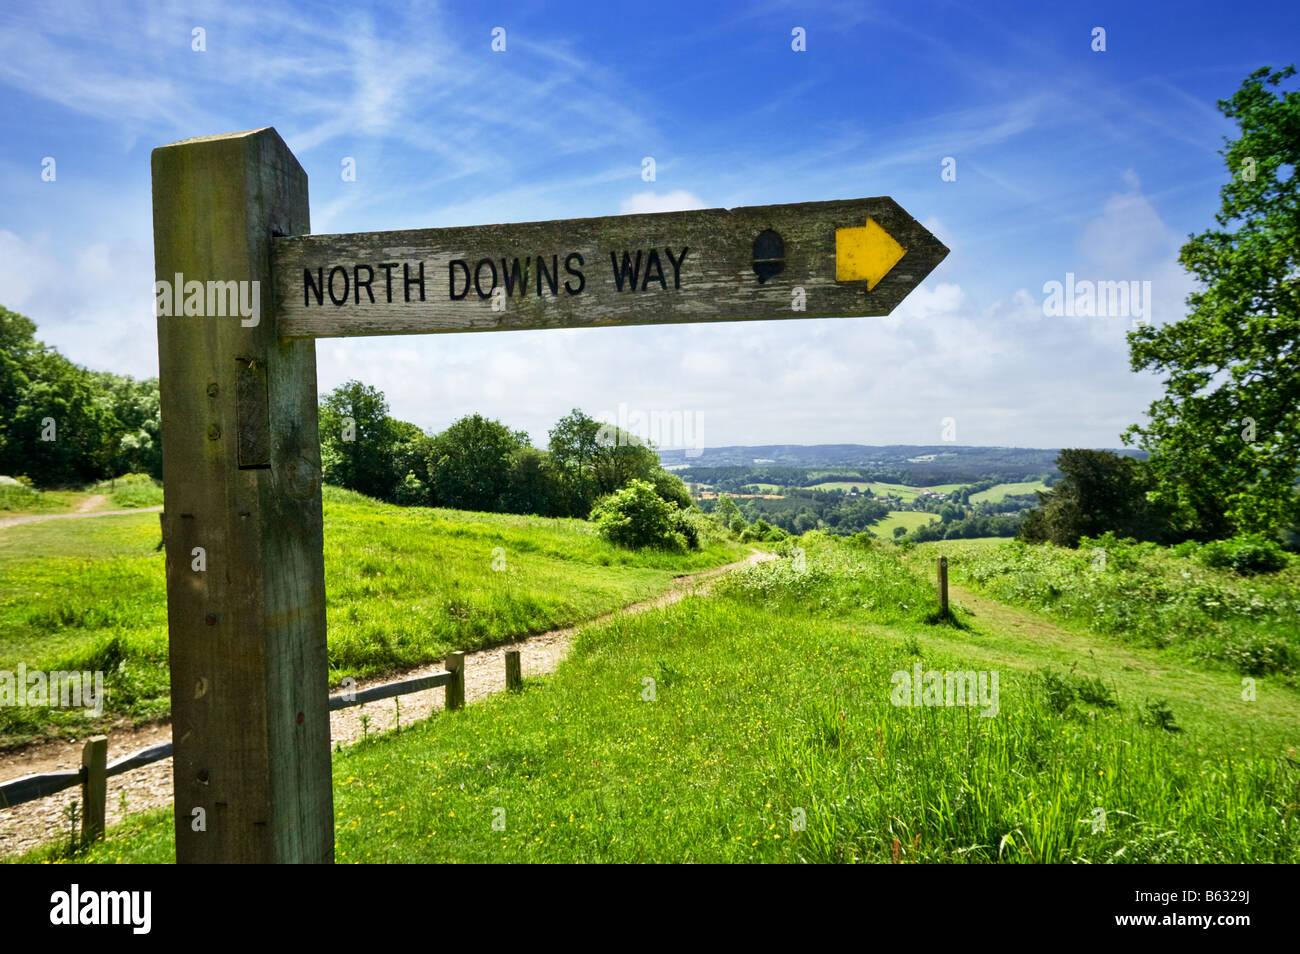 North Downs Way sentier direction panneau signe, Newlands Corner, collines du Surrey, England, UK Photo Stock